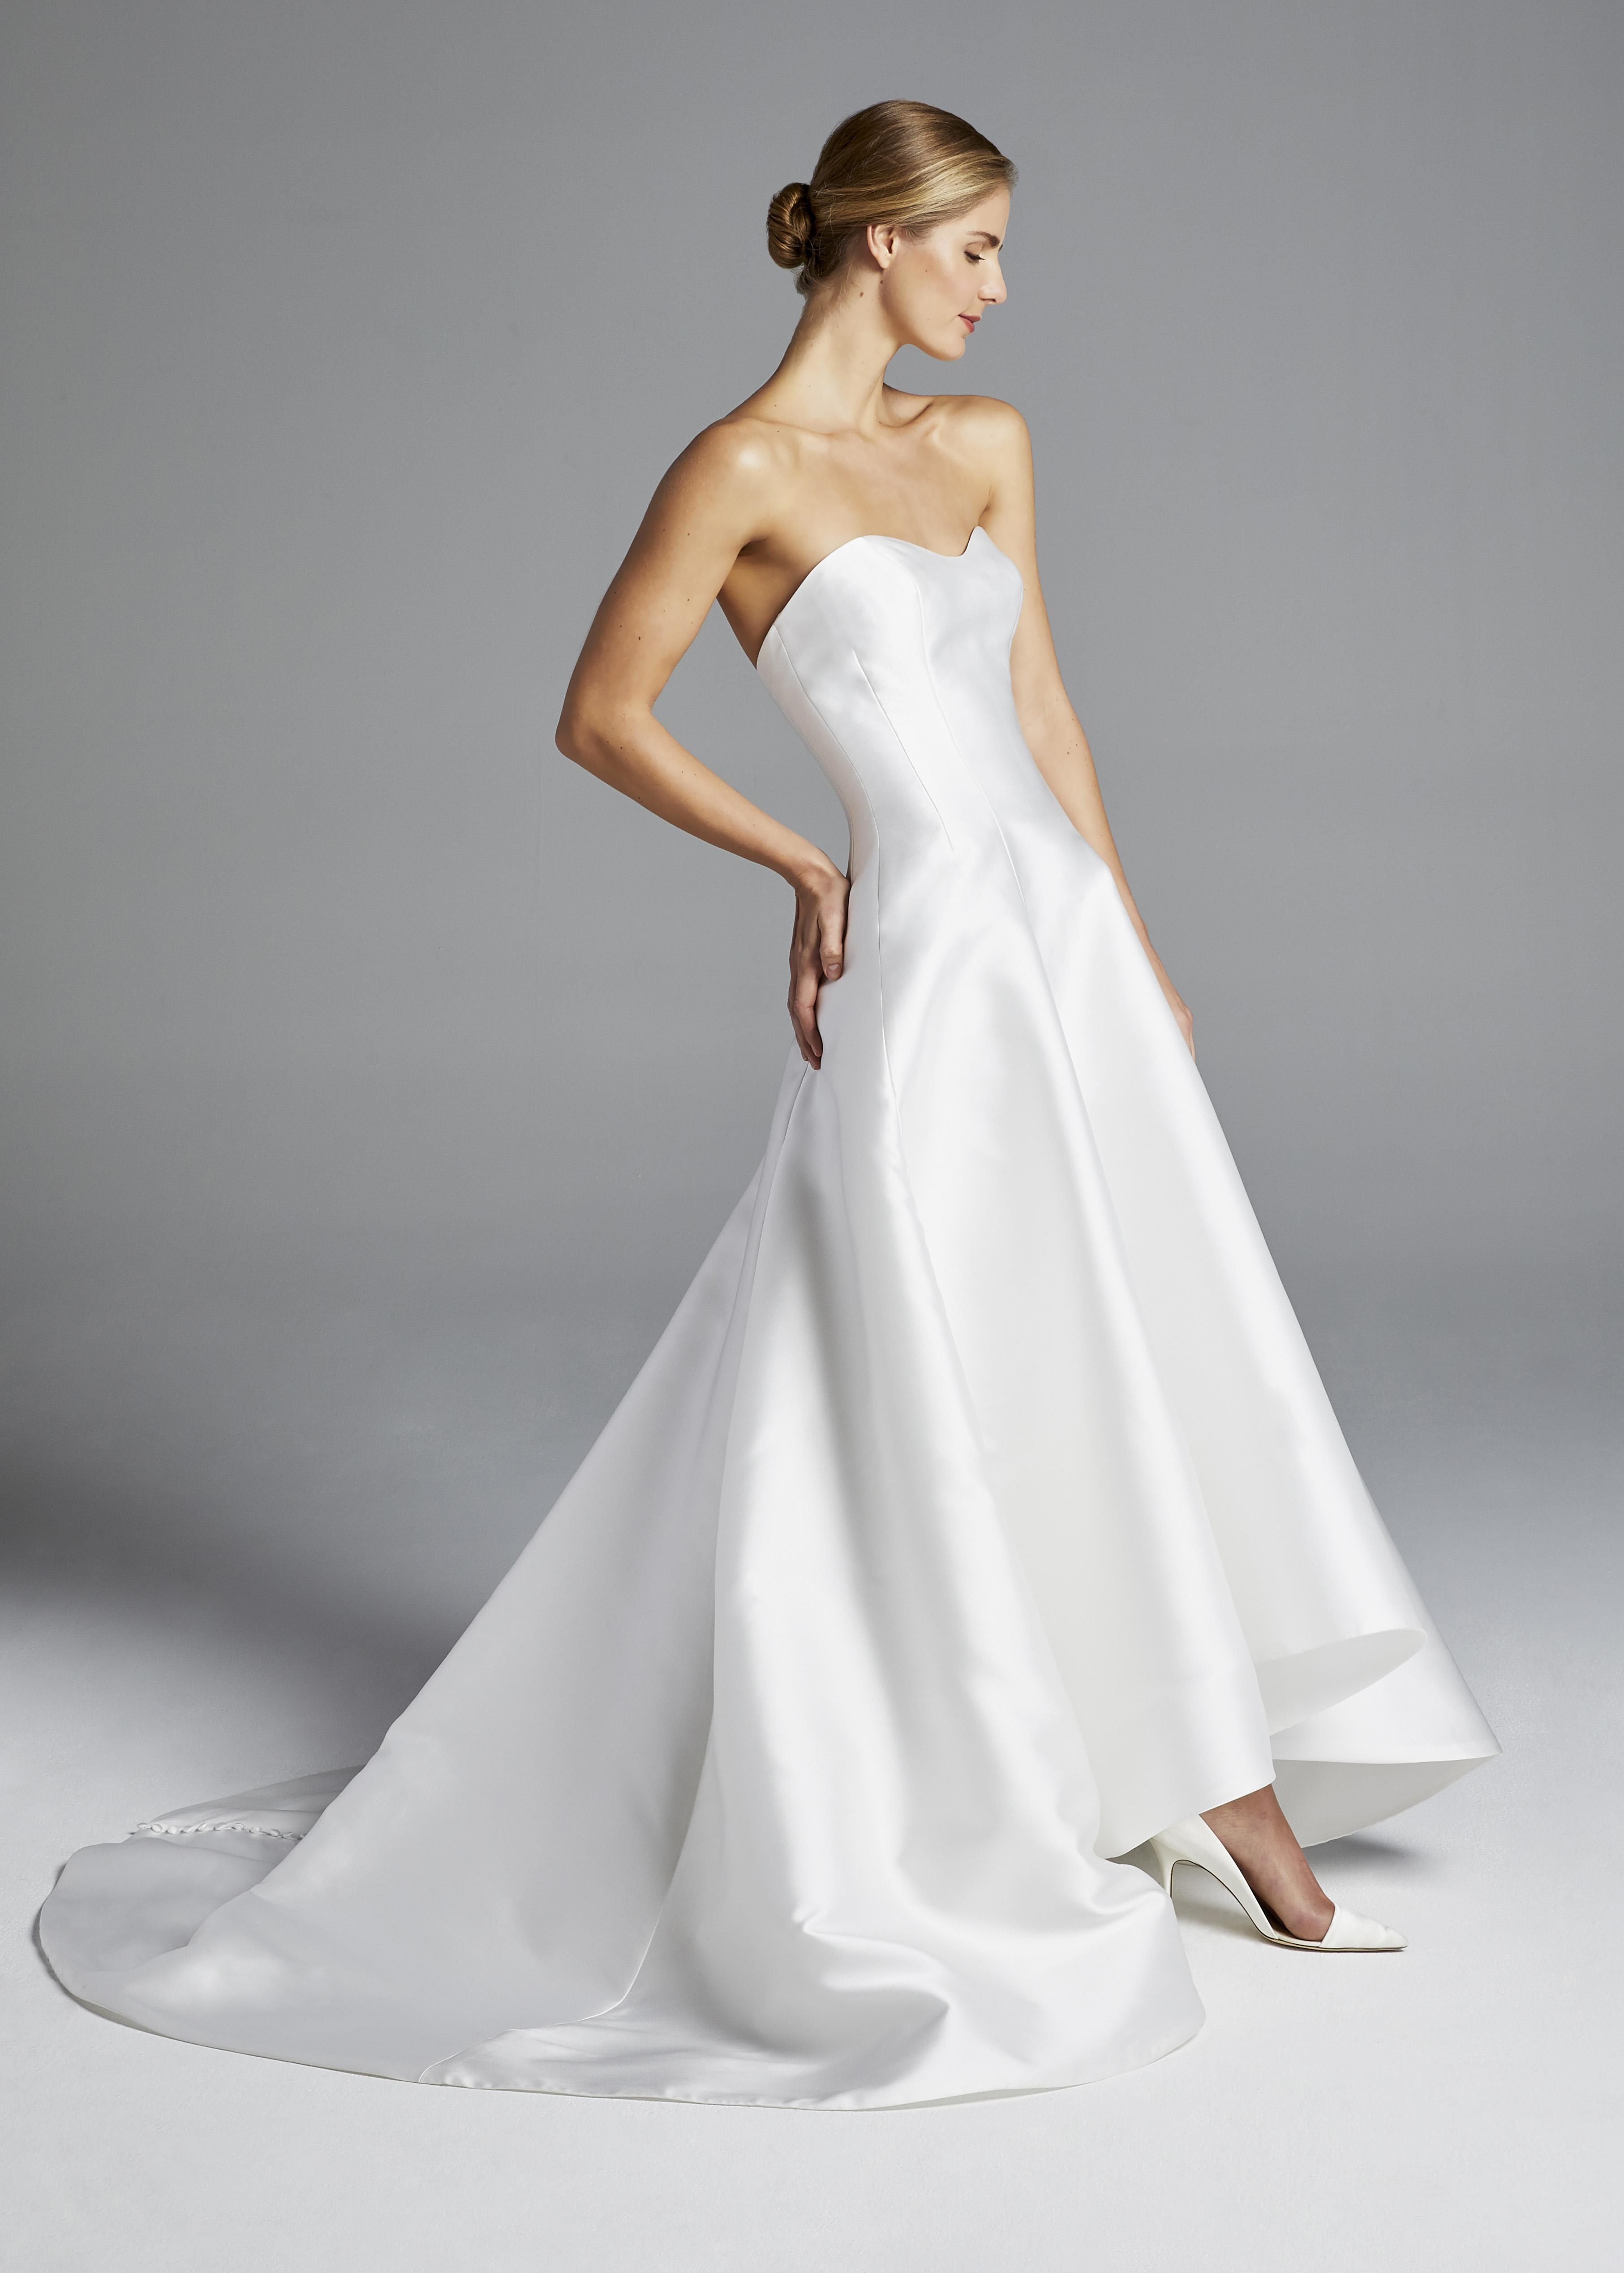 anne barge satin sweetheart wedding dress spring 2019